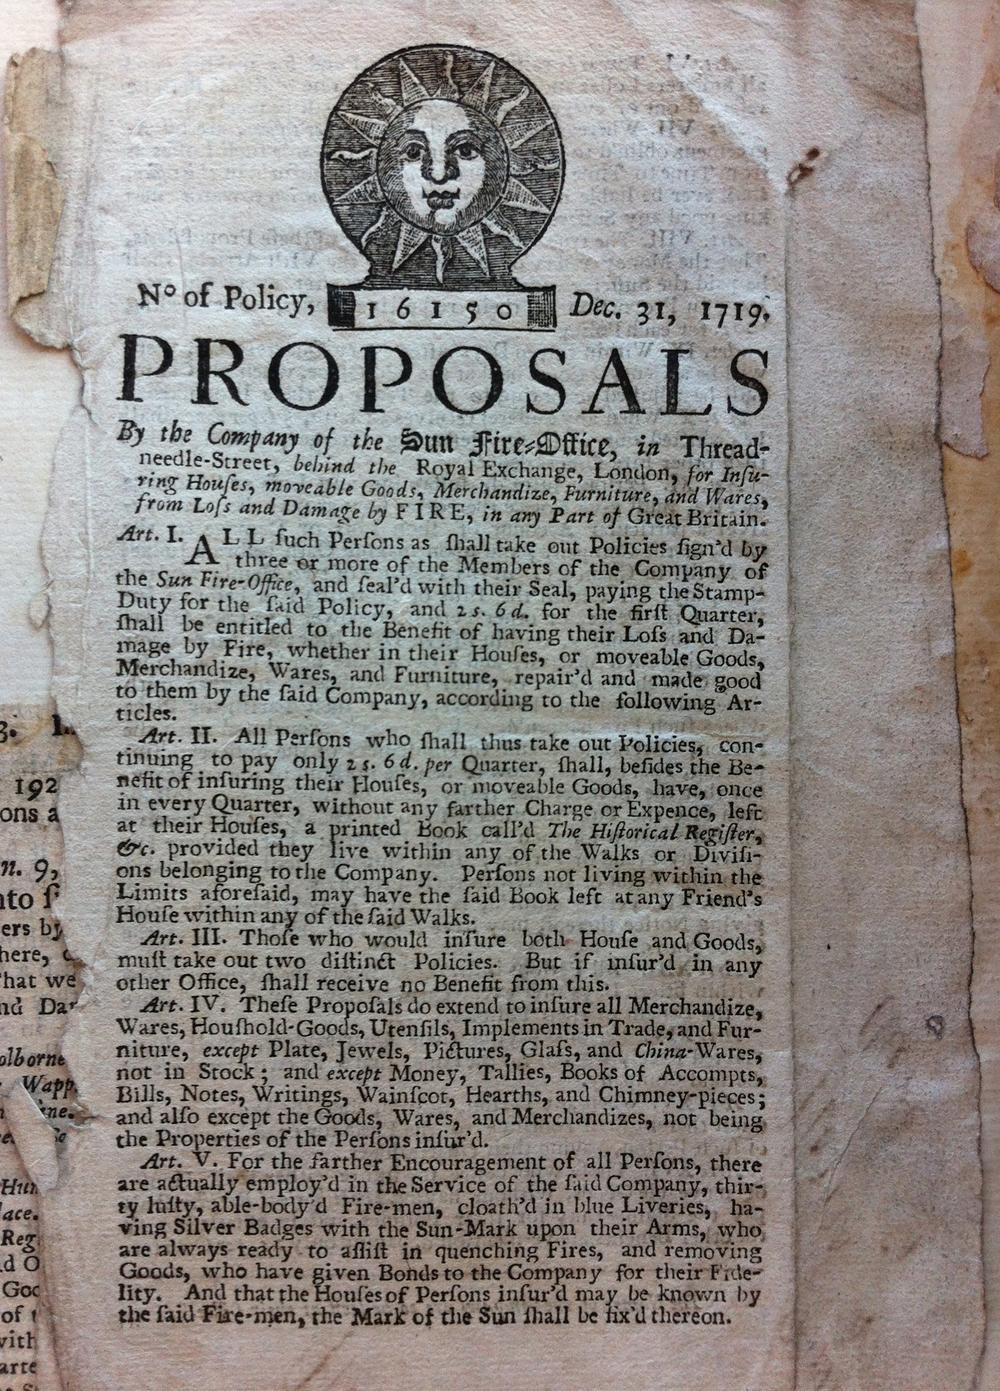 A handbill for the Sun Fire Office, London, 1719